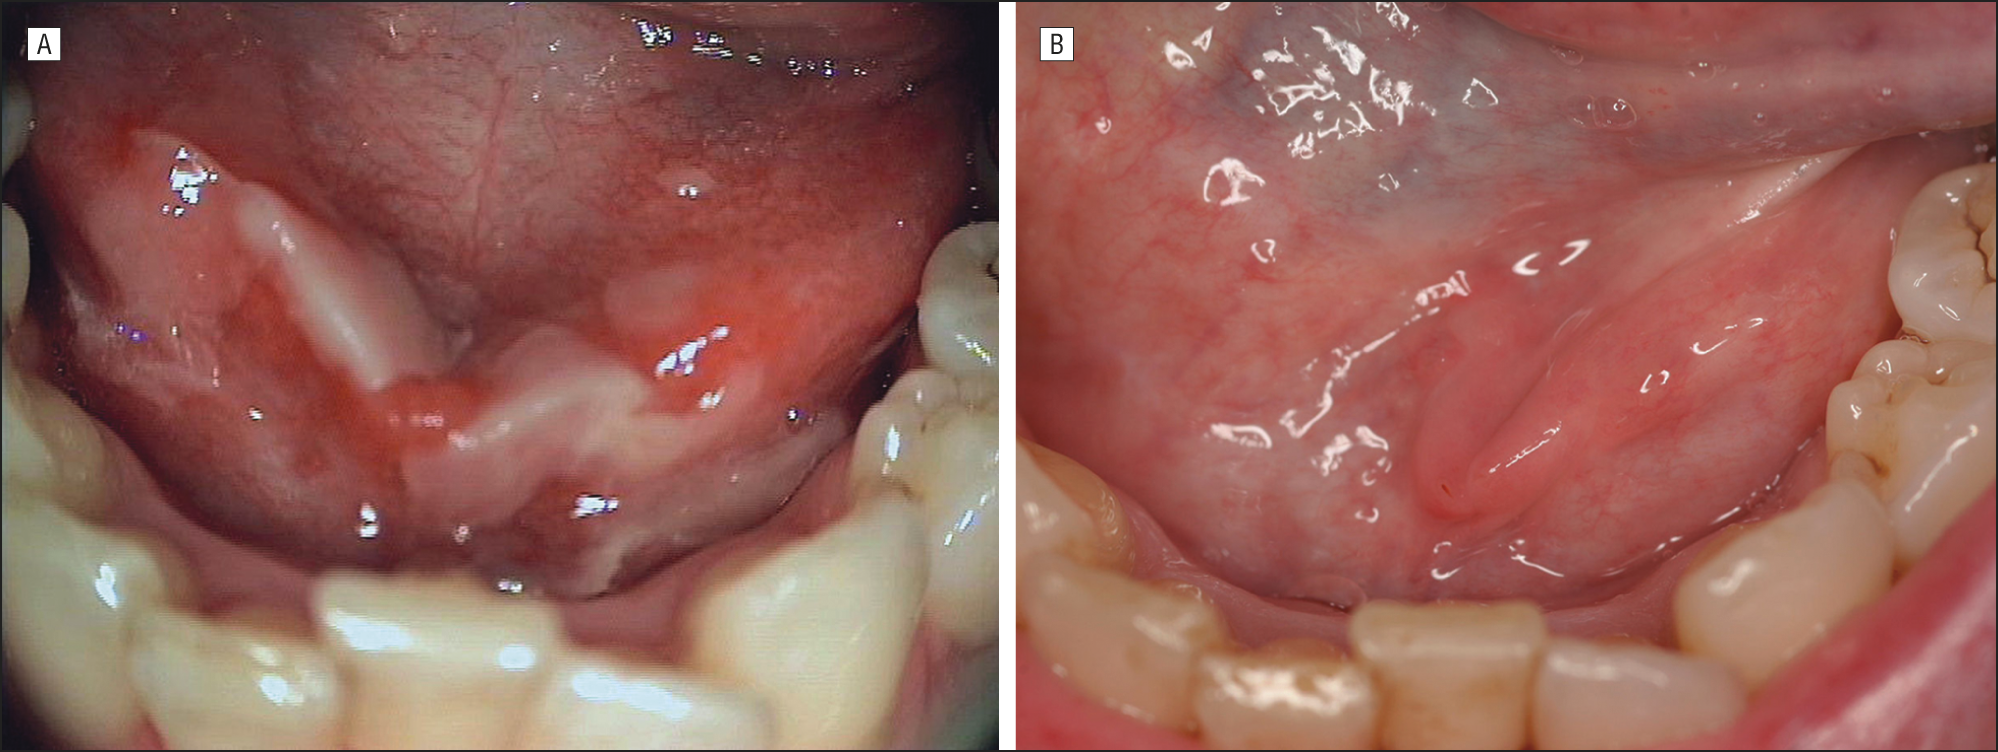 recurrent aphthous stomatitis pdf